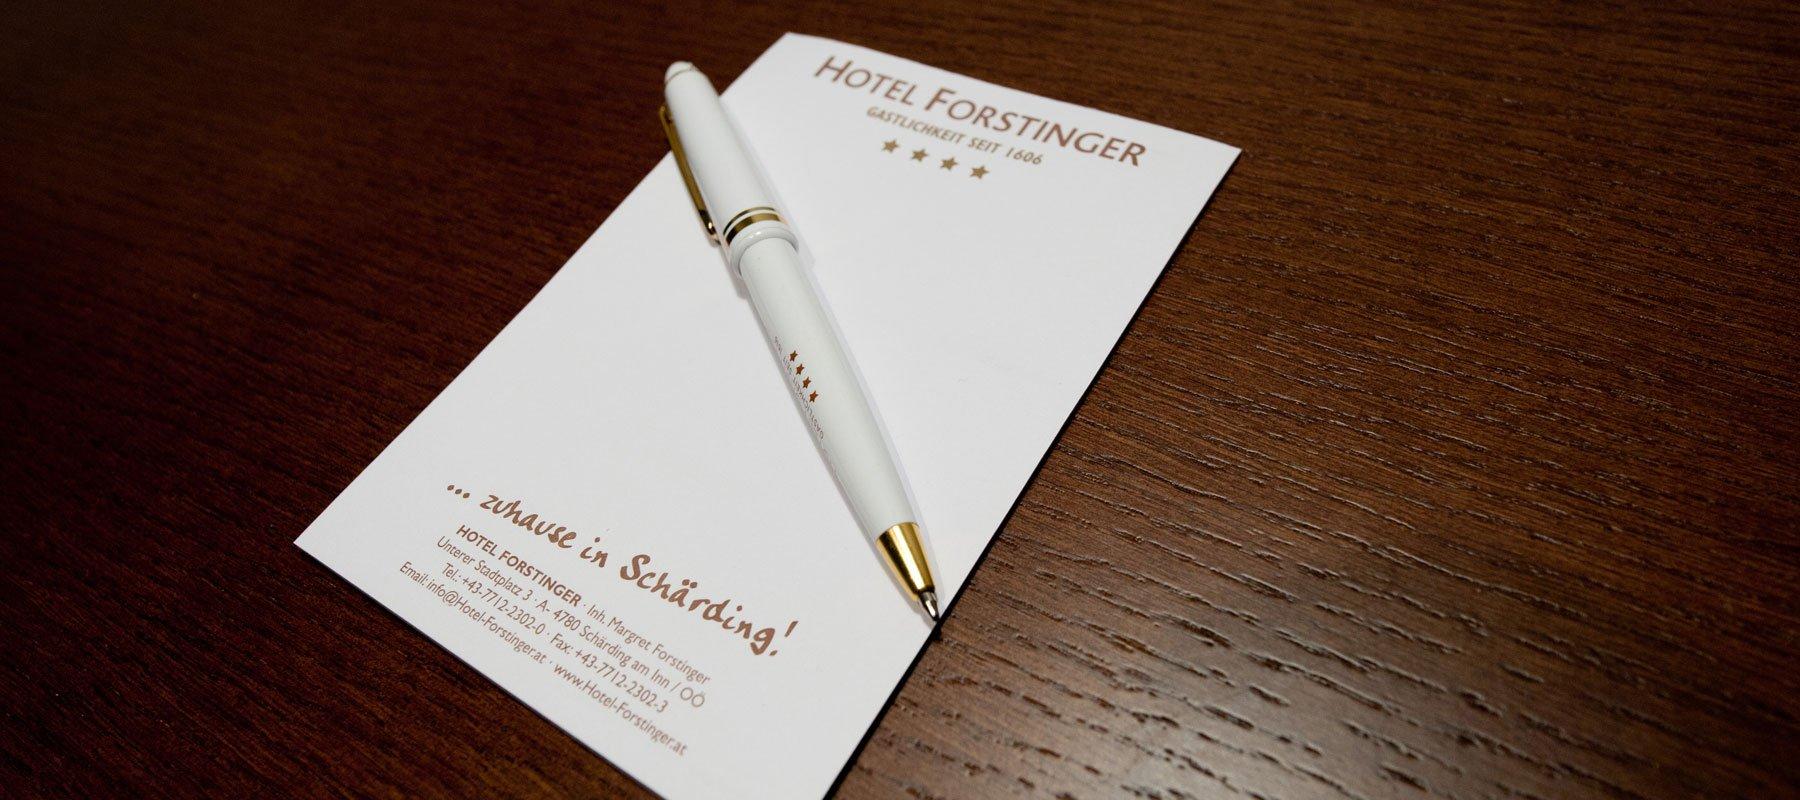 Seminare im Hotel Forstinger